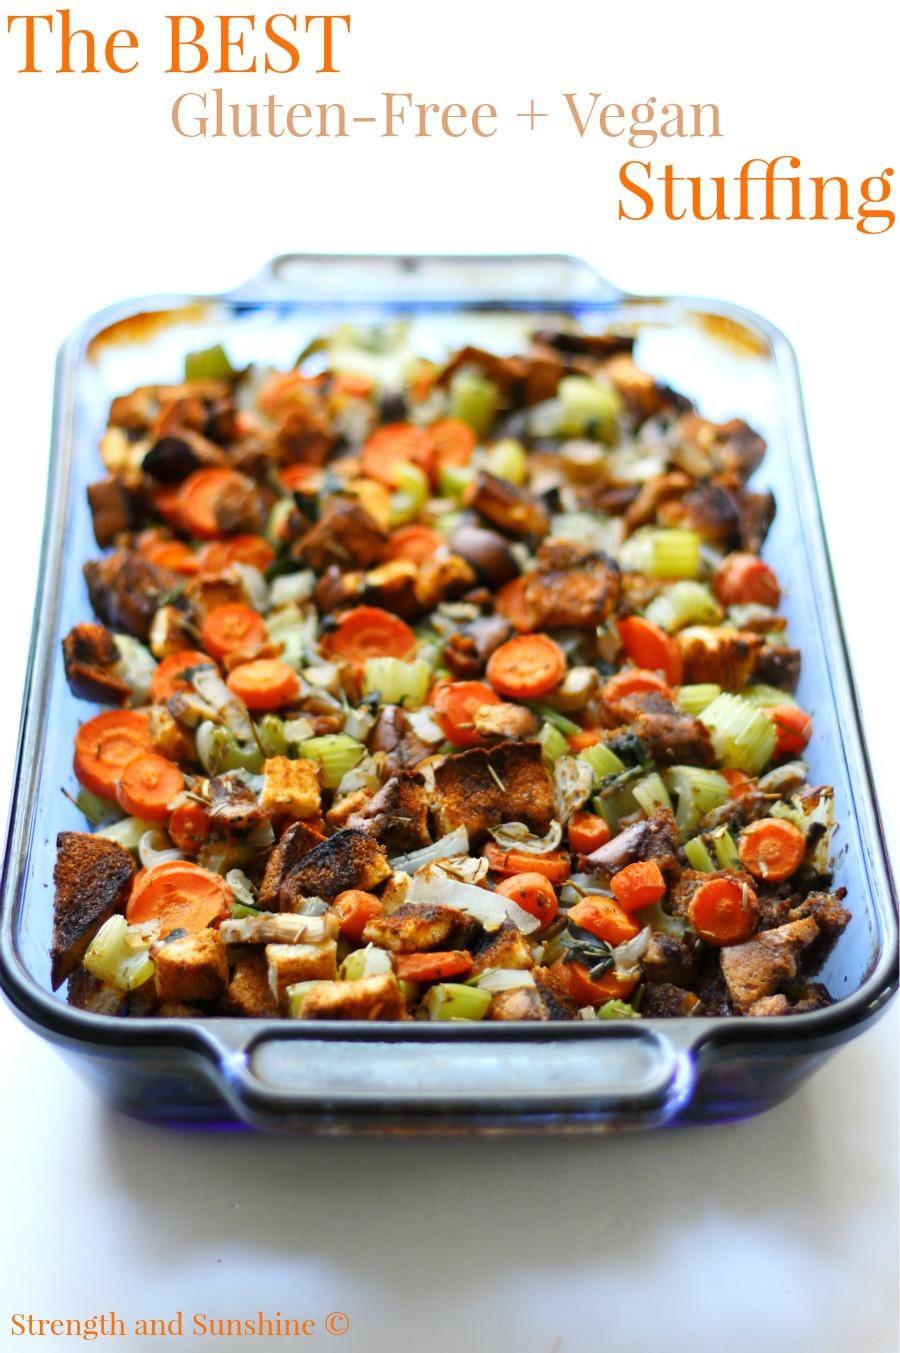 Vegan And Gluten Free Recipes  The Best Gluten Free Vegan Stuffing